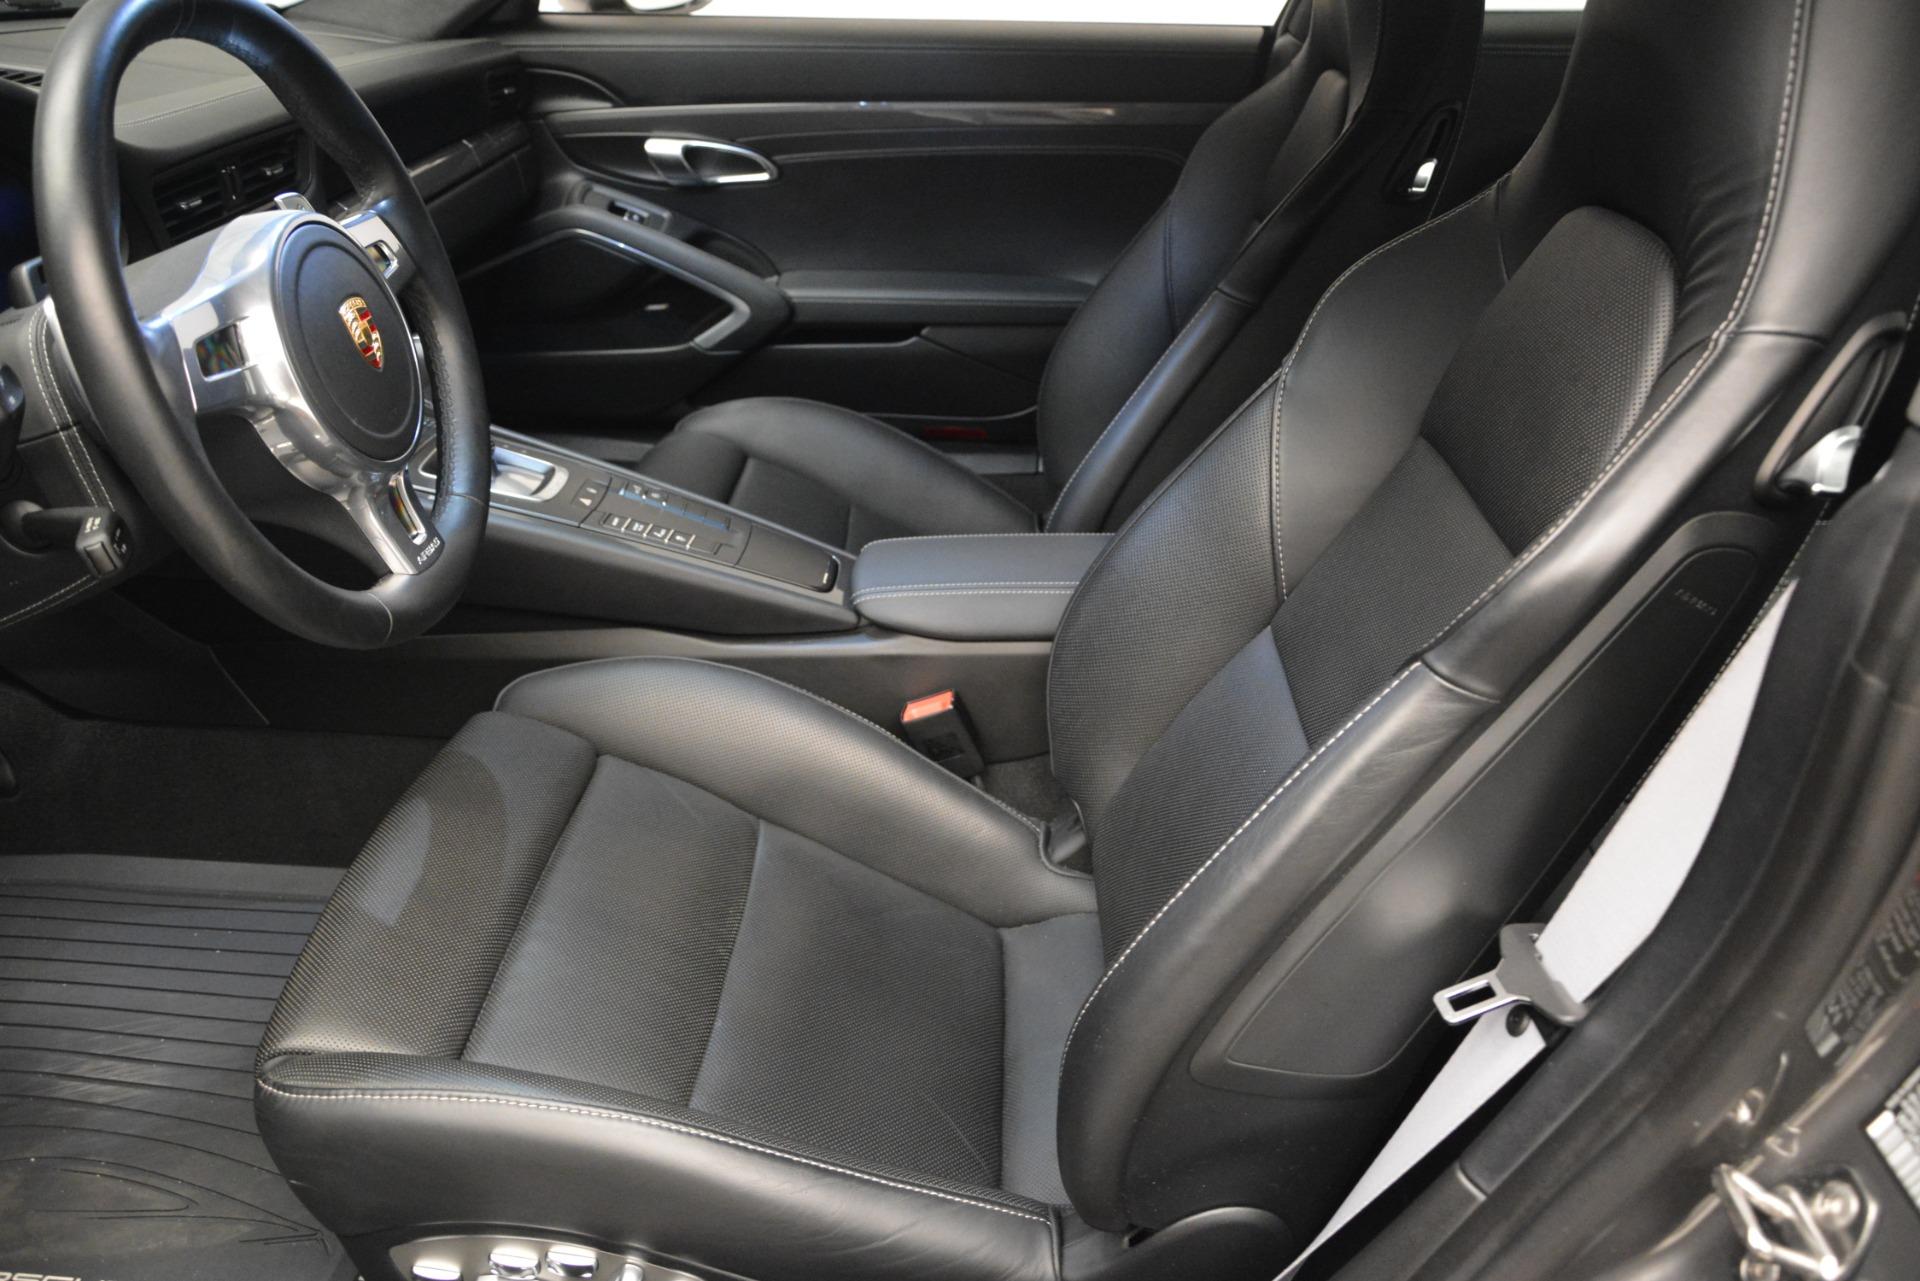 Used 2015 Porsche 911 Turbo S | Greenwich, CT